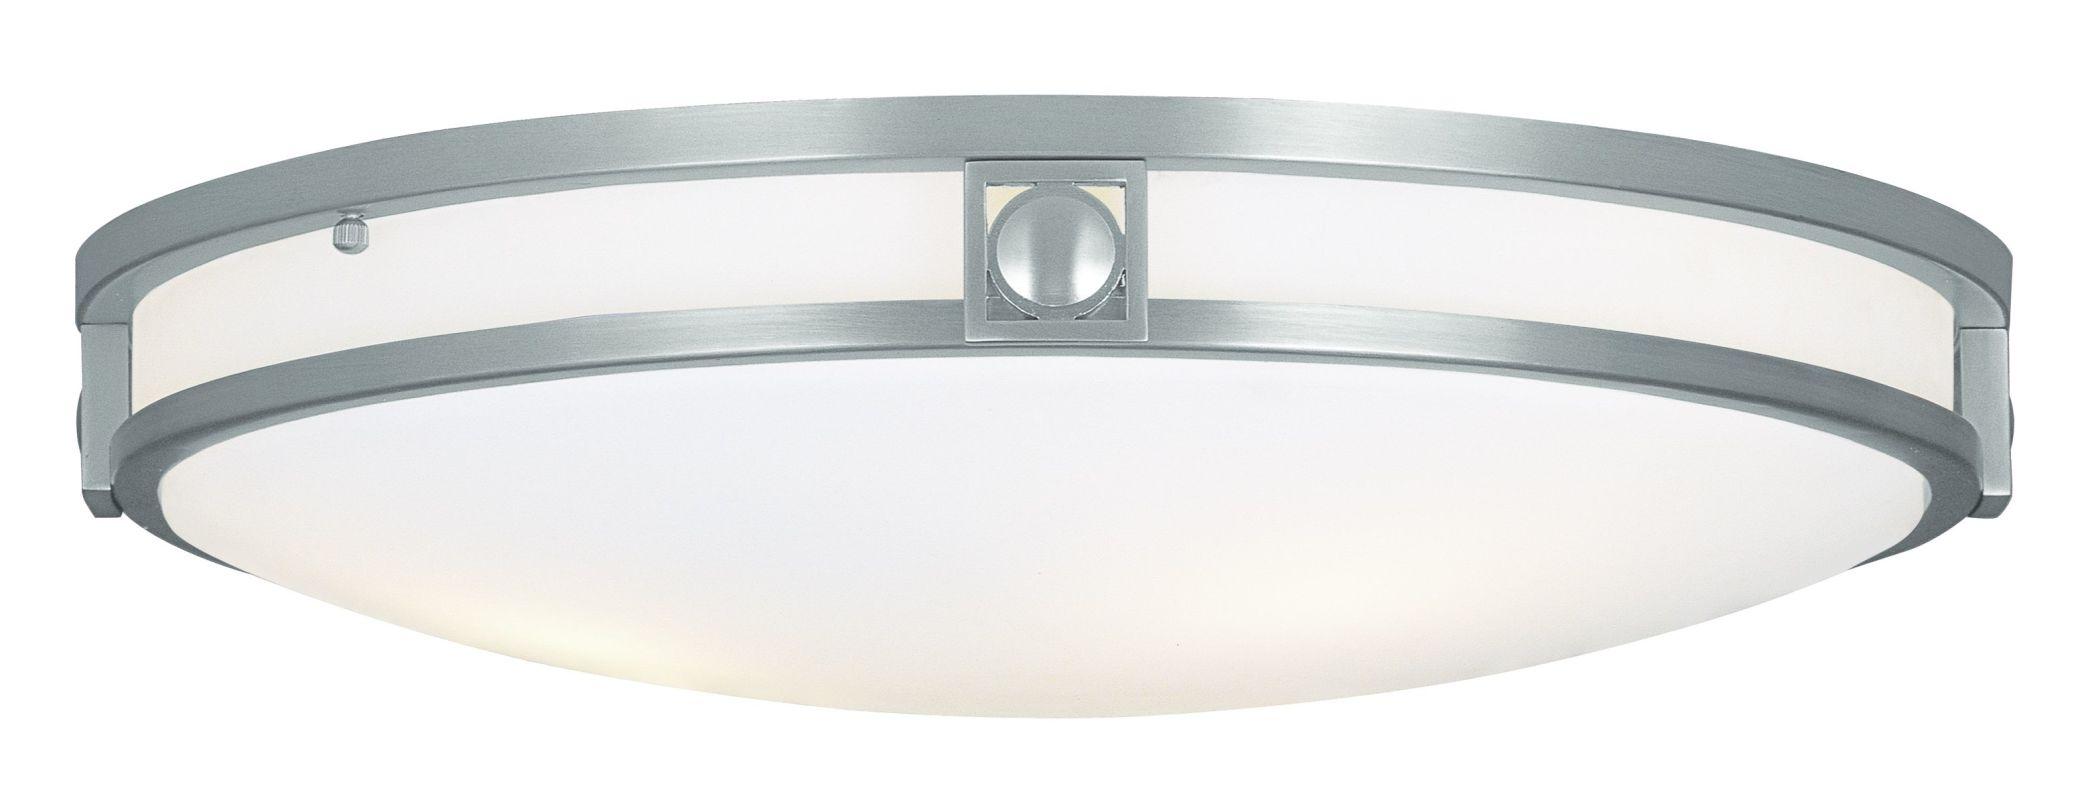 Livex Lighting 4489 3 Light 180 Watt Flushmount Ceiling Fixture with